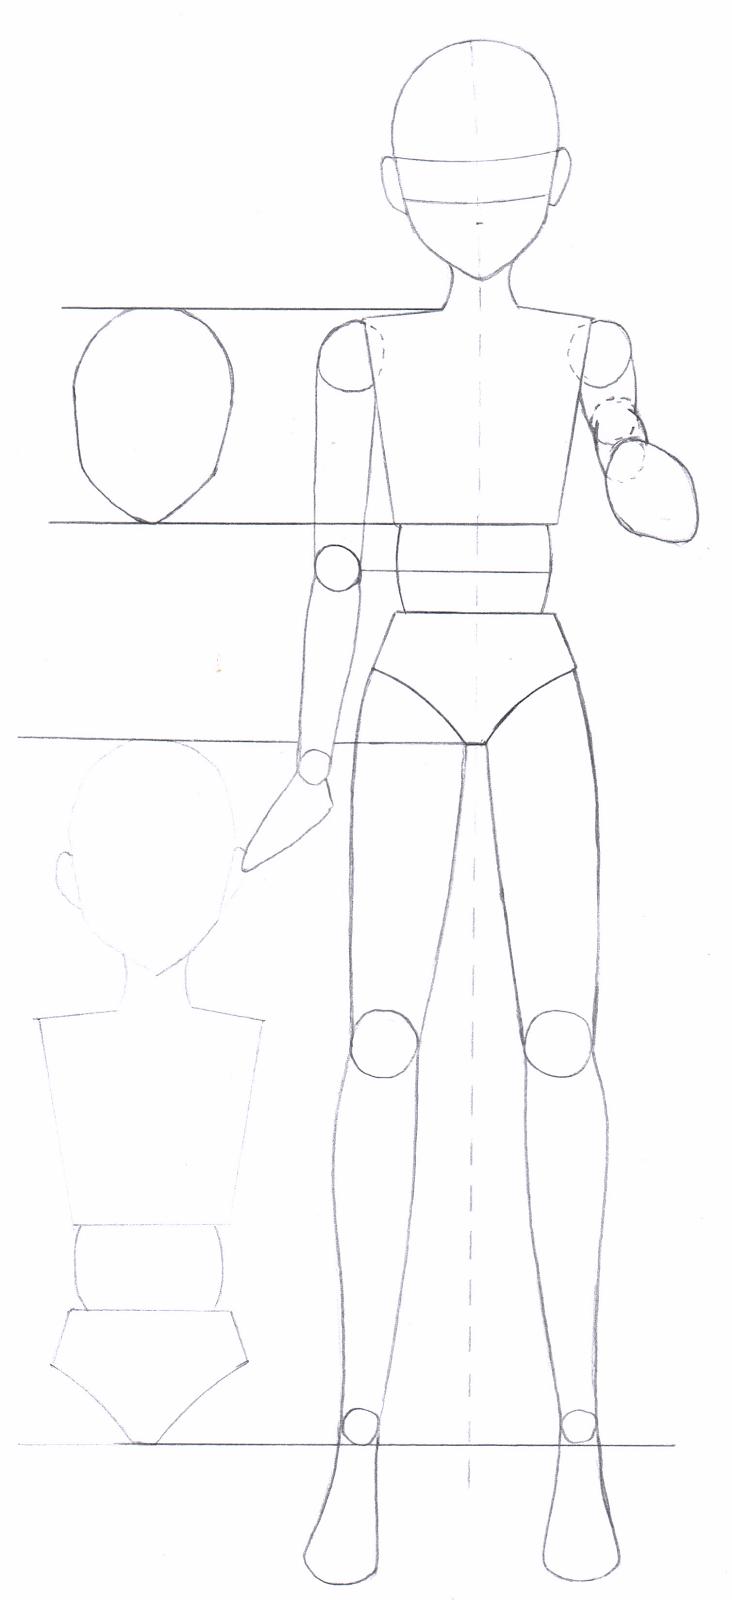 Pin Auf How To Draw People Manga And Anime